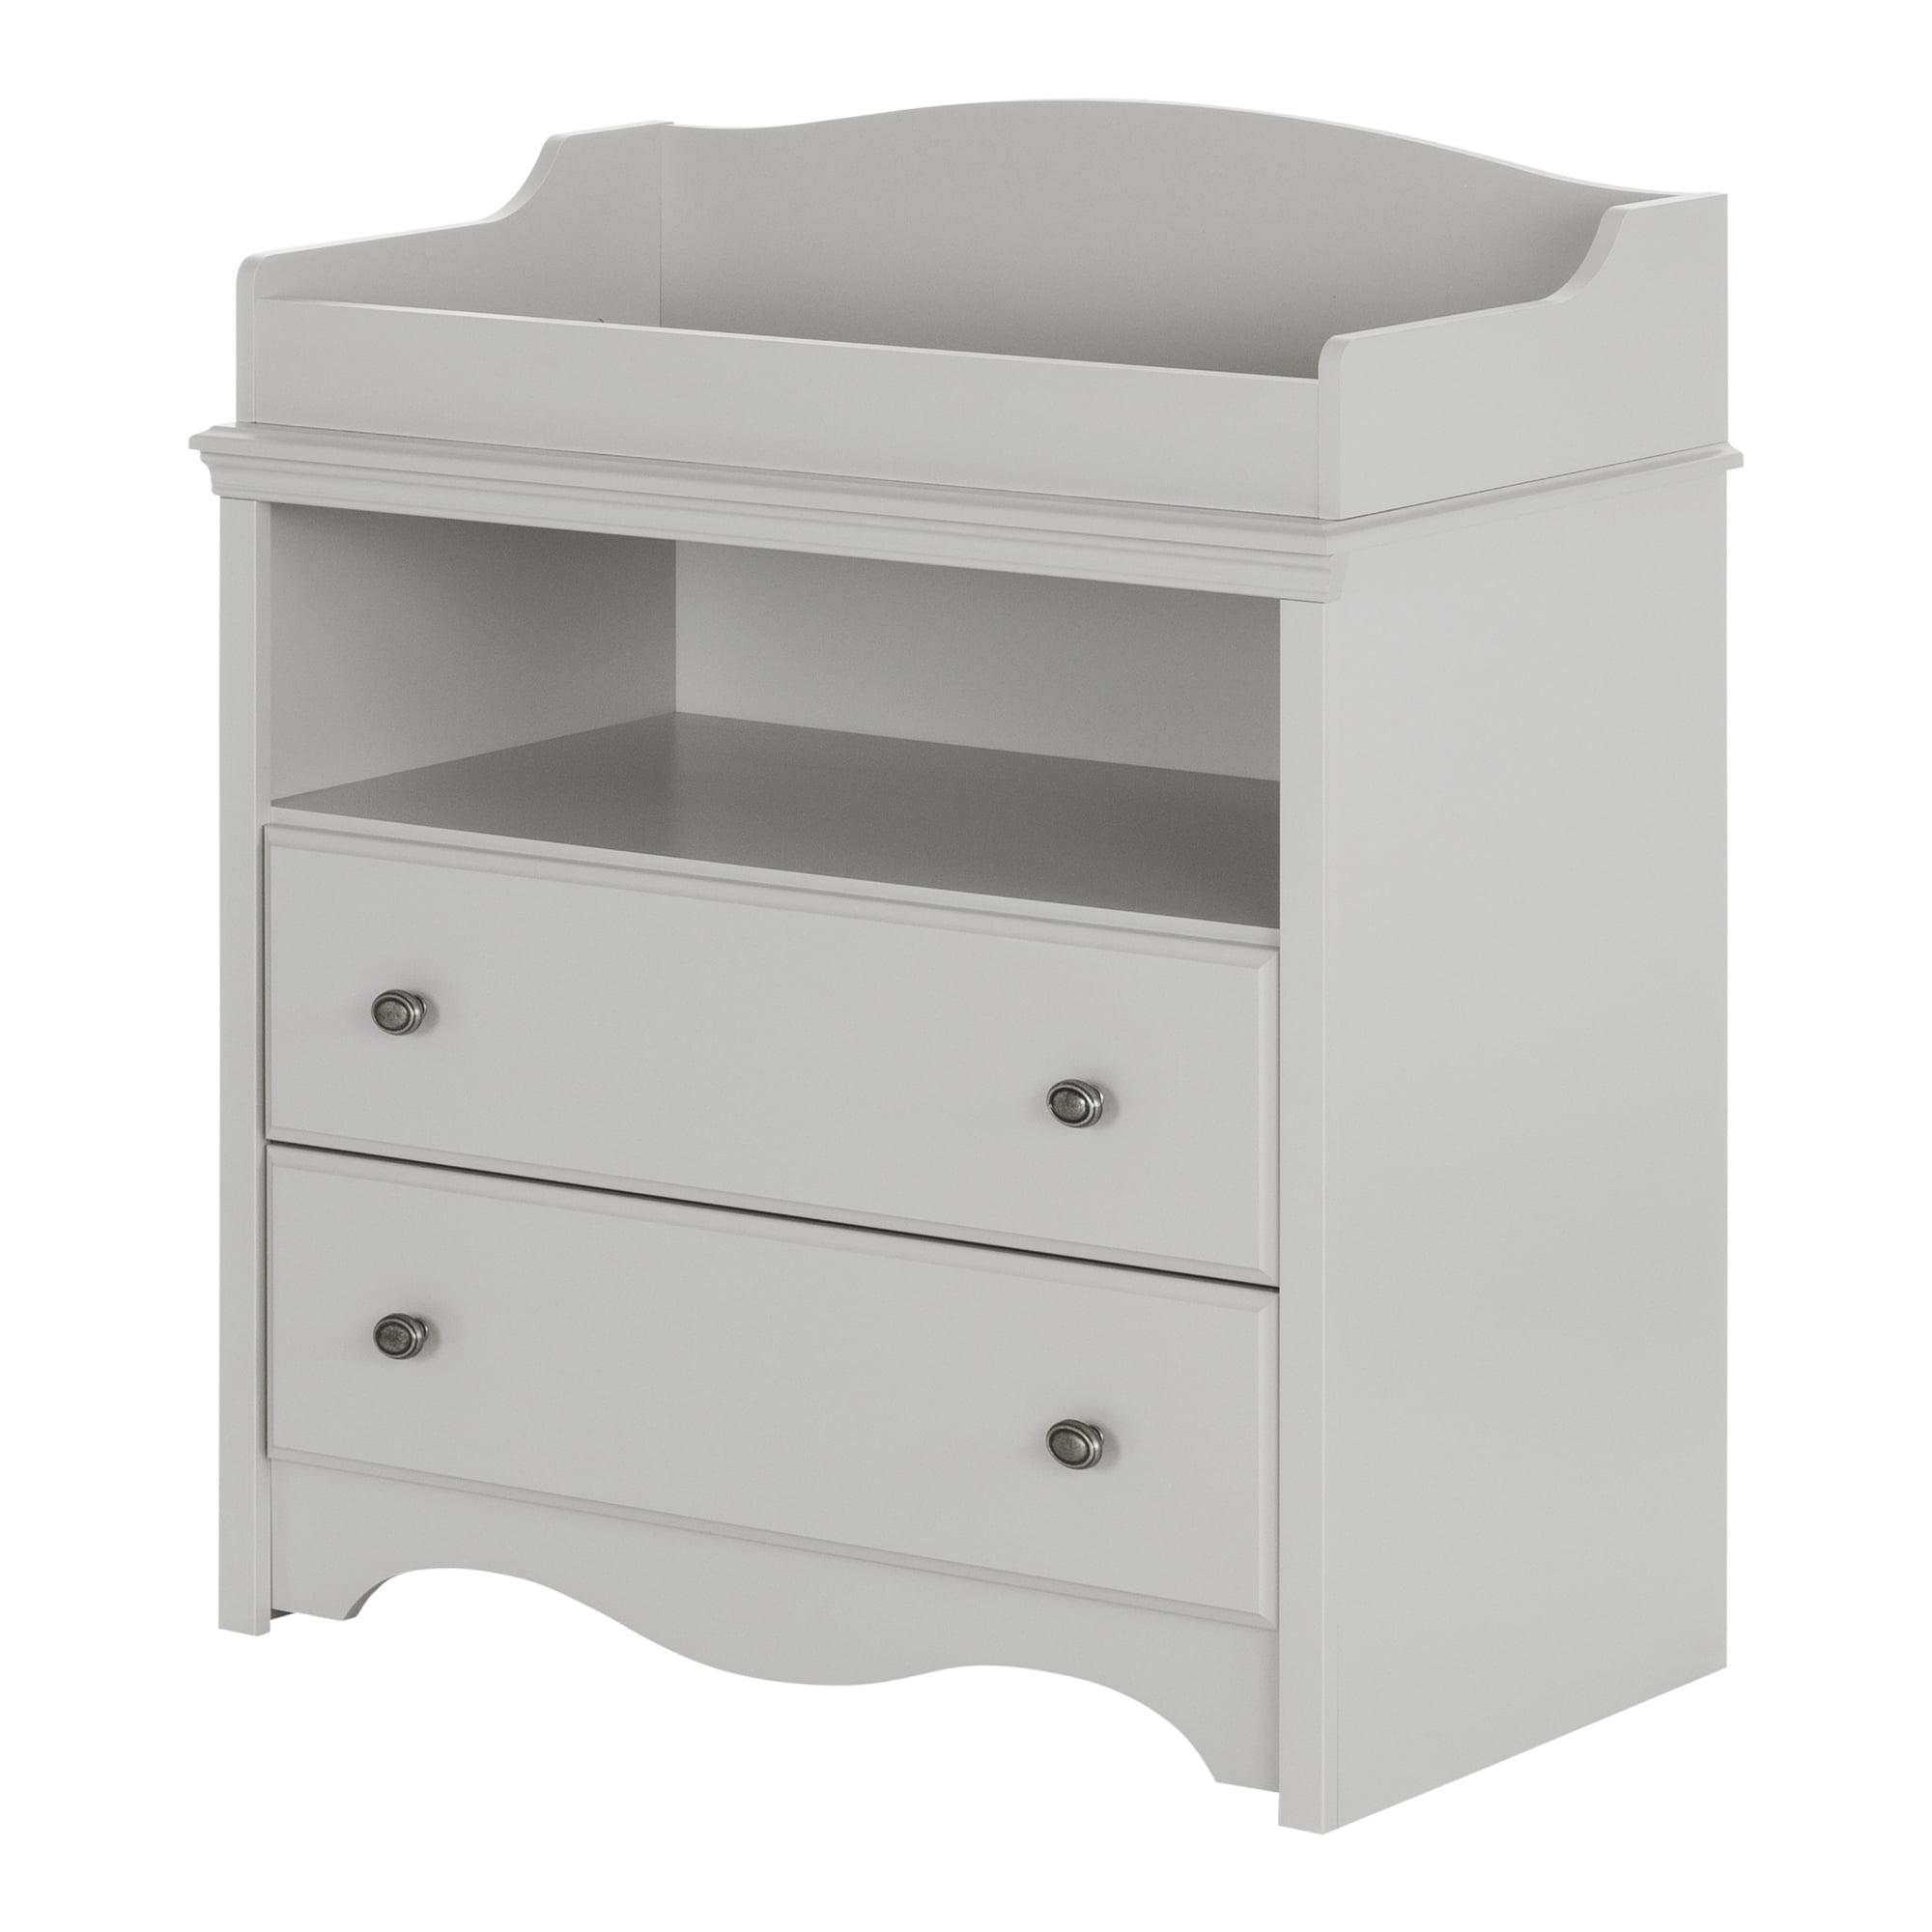 changing little nursery table bears in dresser bear img recipris s